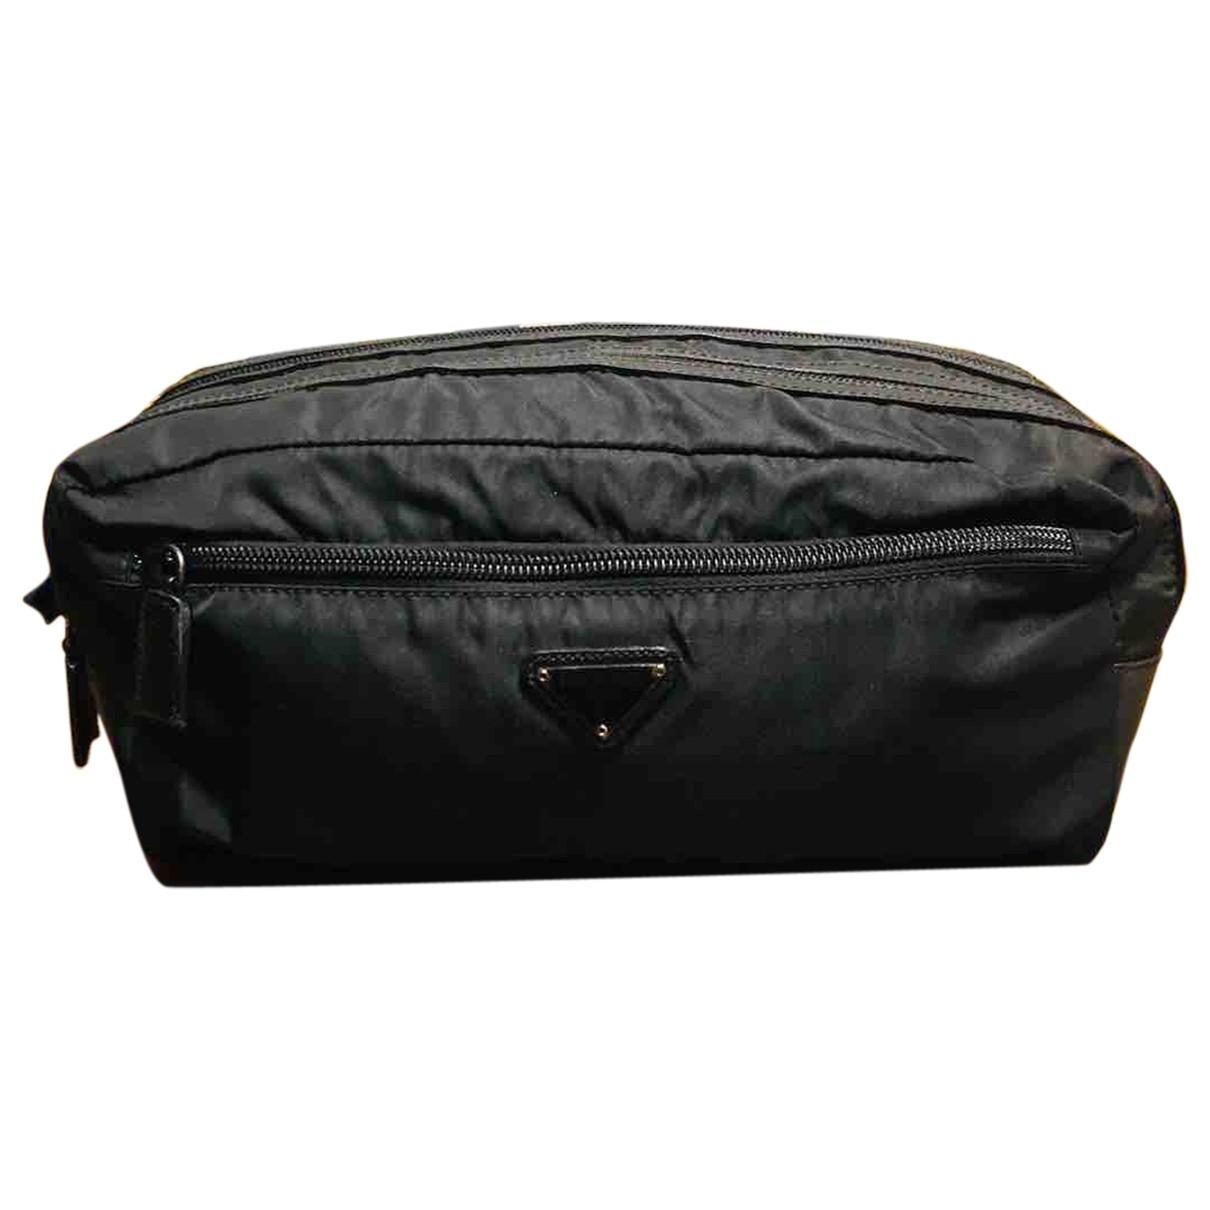 Prada N Black Cloth Small bag, wallet & cases for Men N